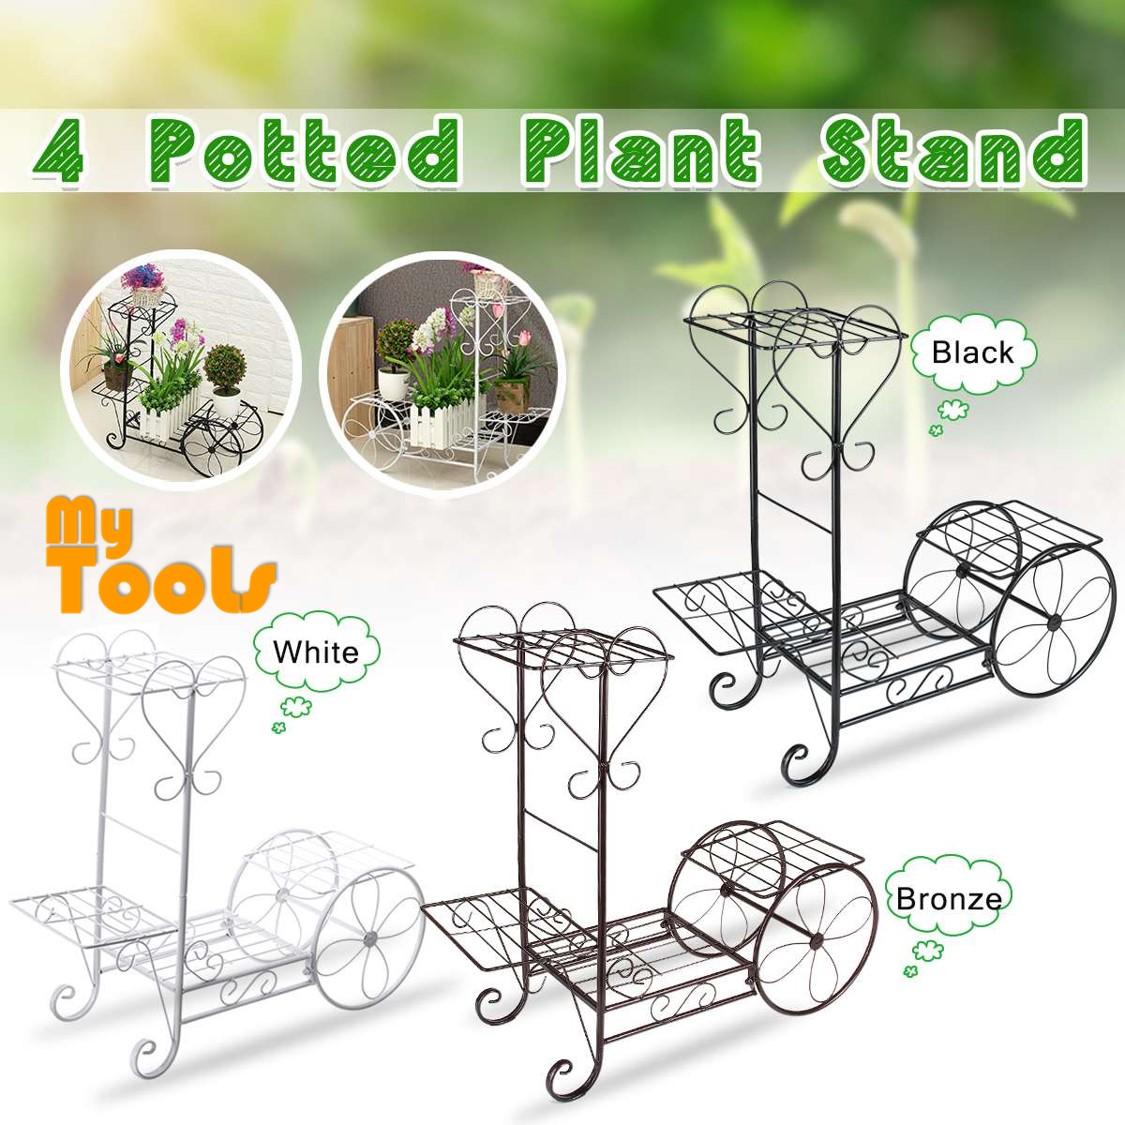 Mytools 4 layer Metal Plant Stand Iron Flower Pot Stand Rack Shelves Display Floor Standing Indoor Outdoor Flowerpot Stand Iron Holder